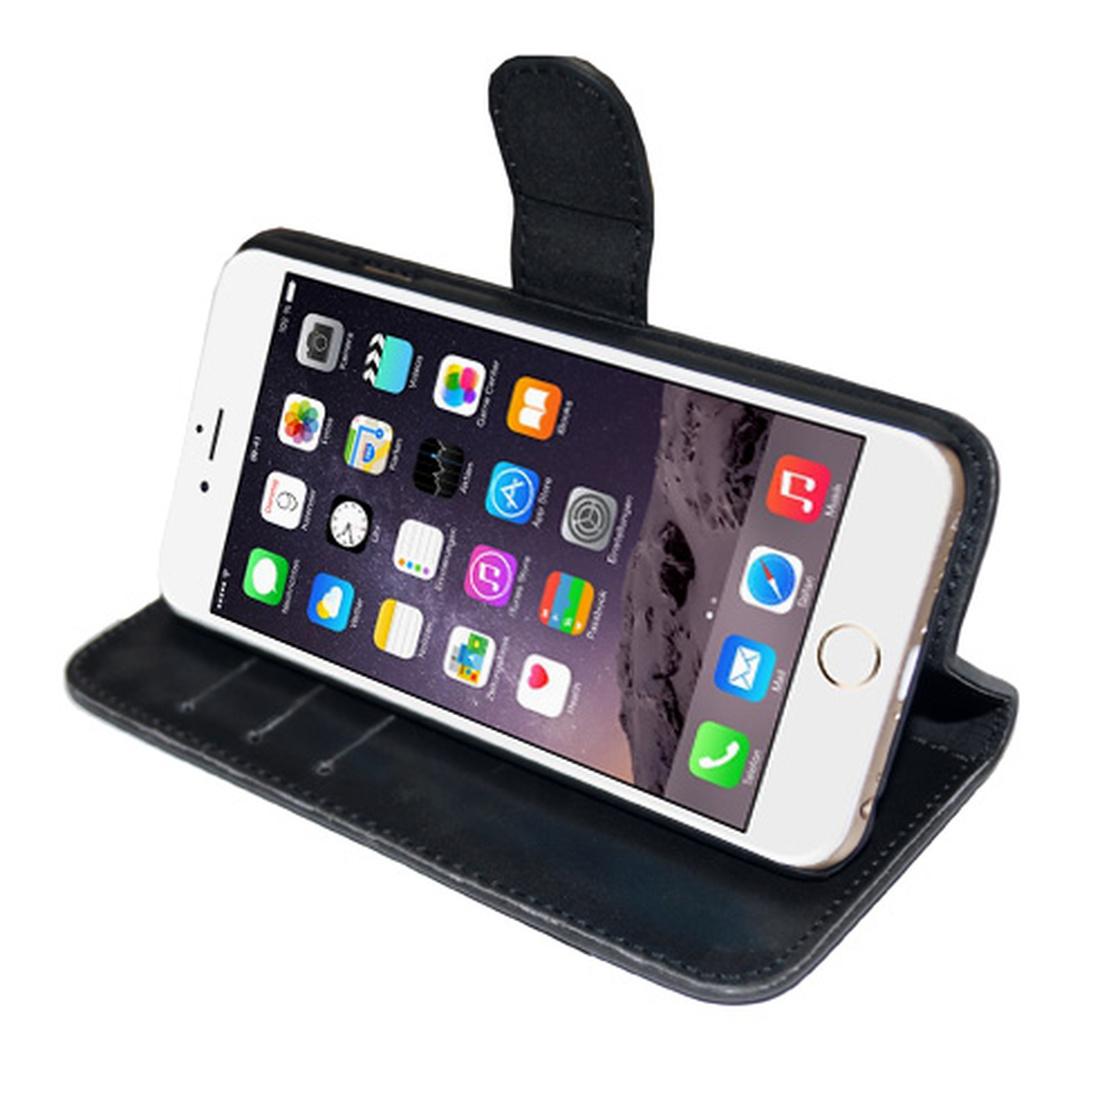 leder bookstyle tasche mit lasche f r iphone 7 plus. Black Bedroom Furniture Sets. Home Design Ideas